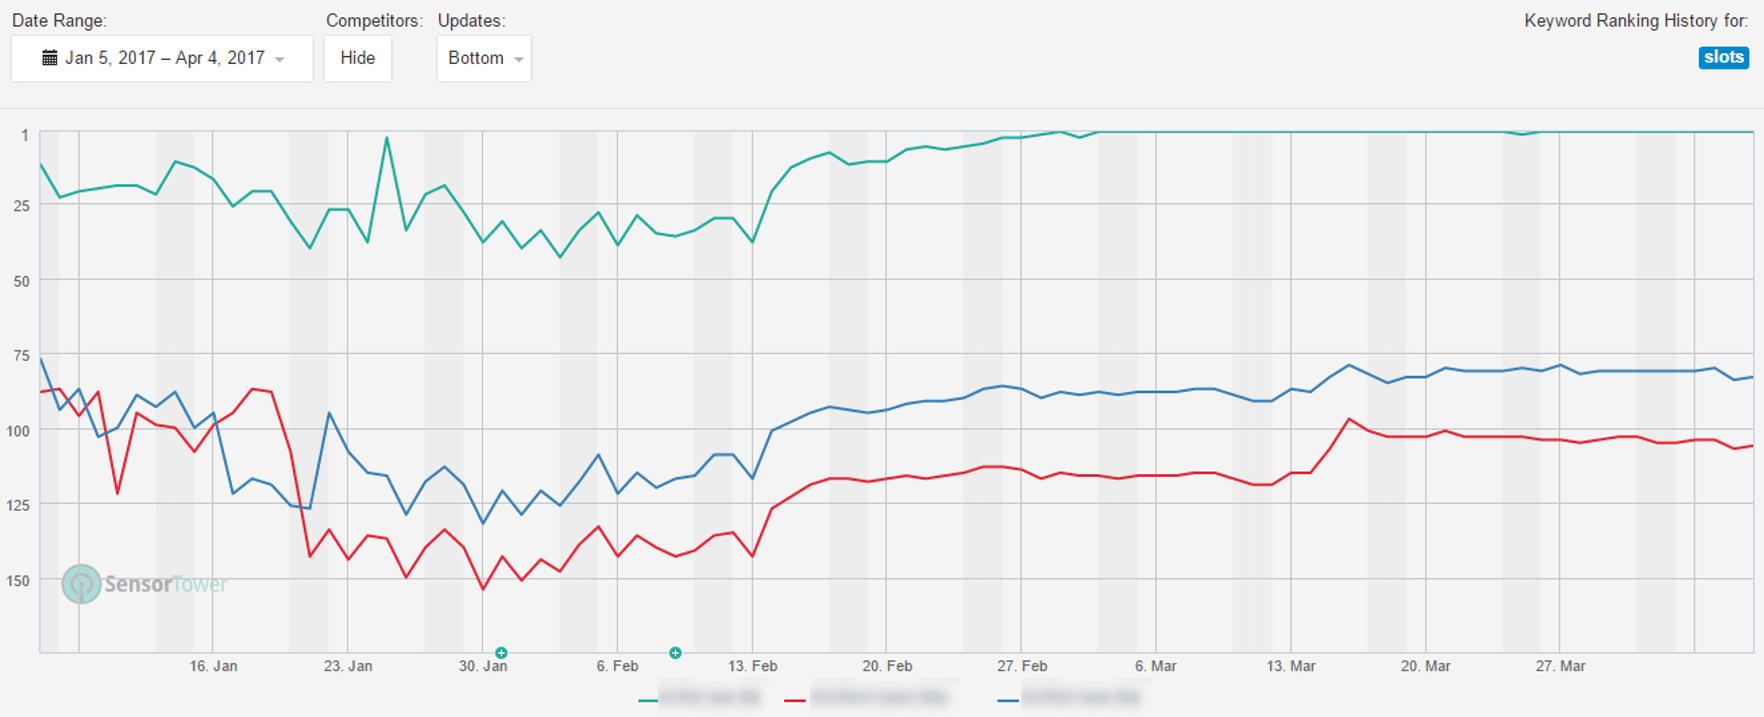 slots publisher keyword ranking 3